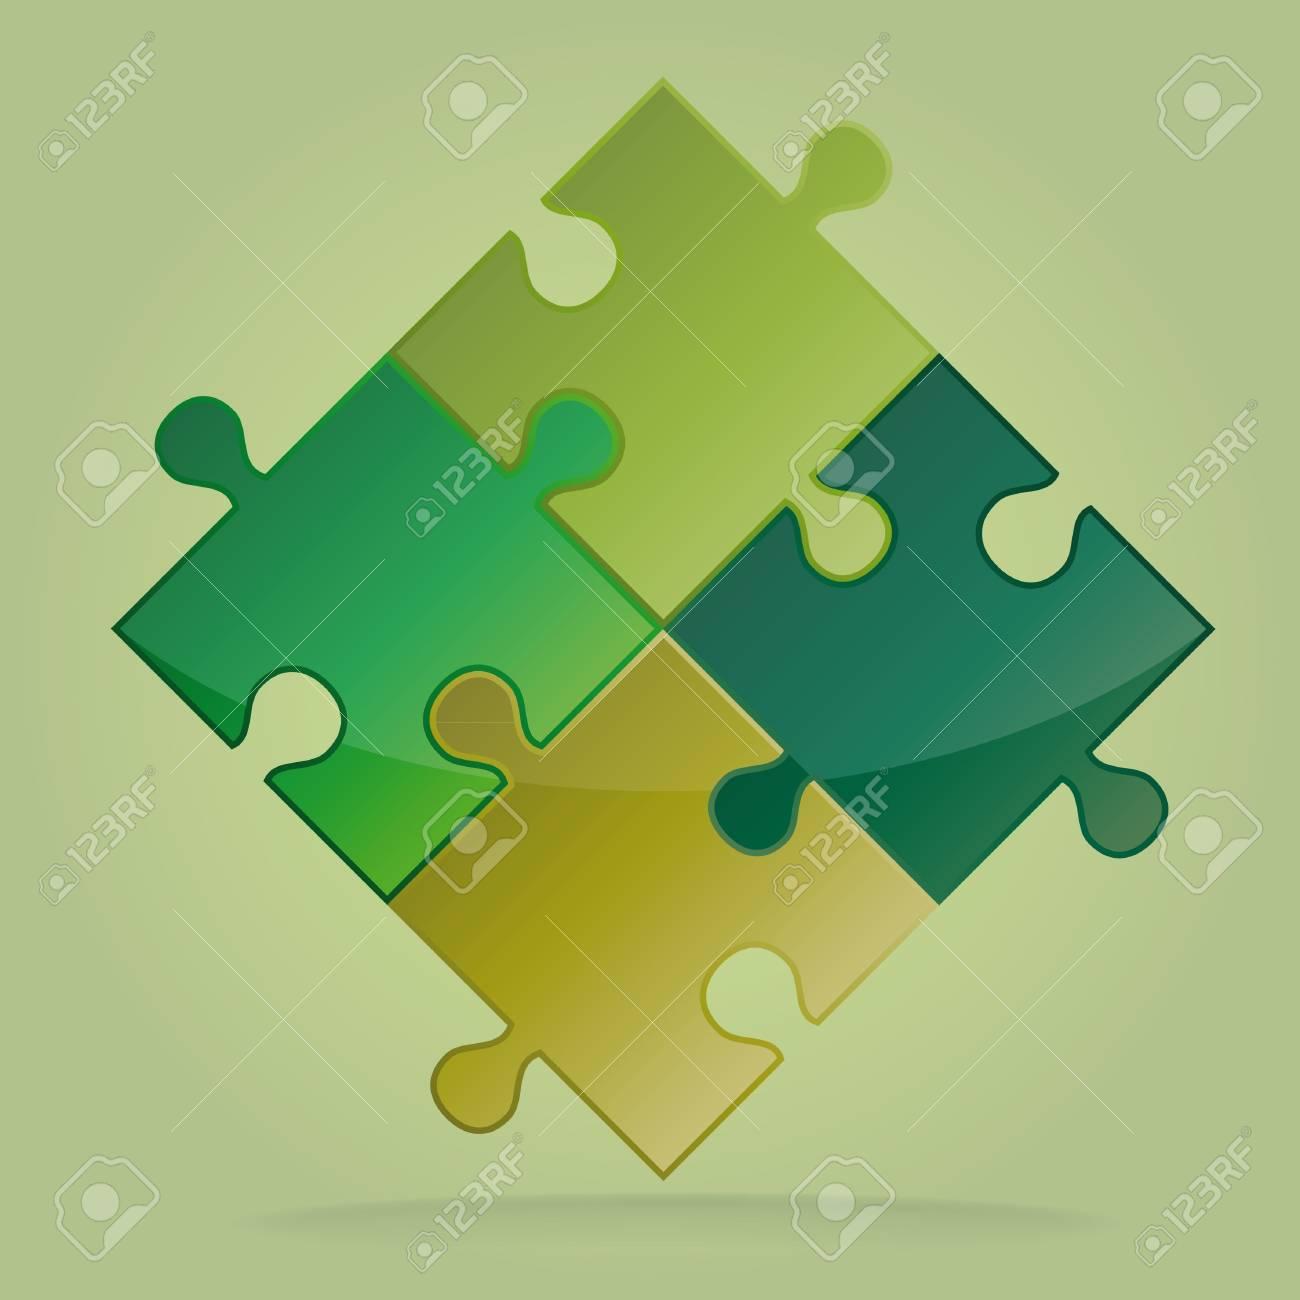 creative 3D puzzle background Stock Photo - 14766269